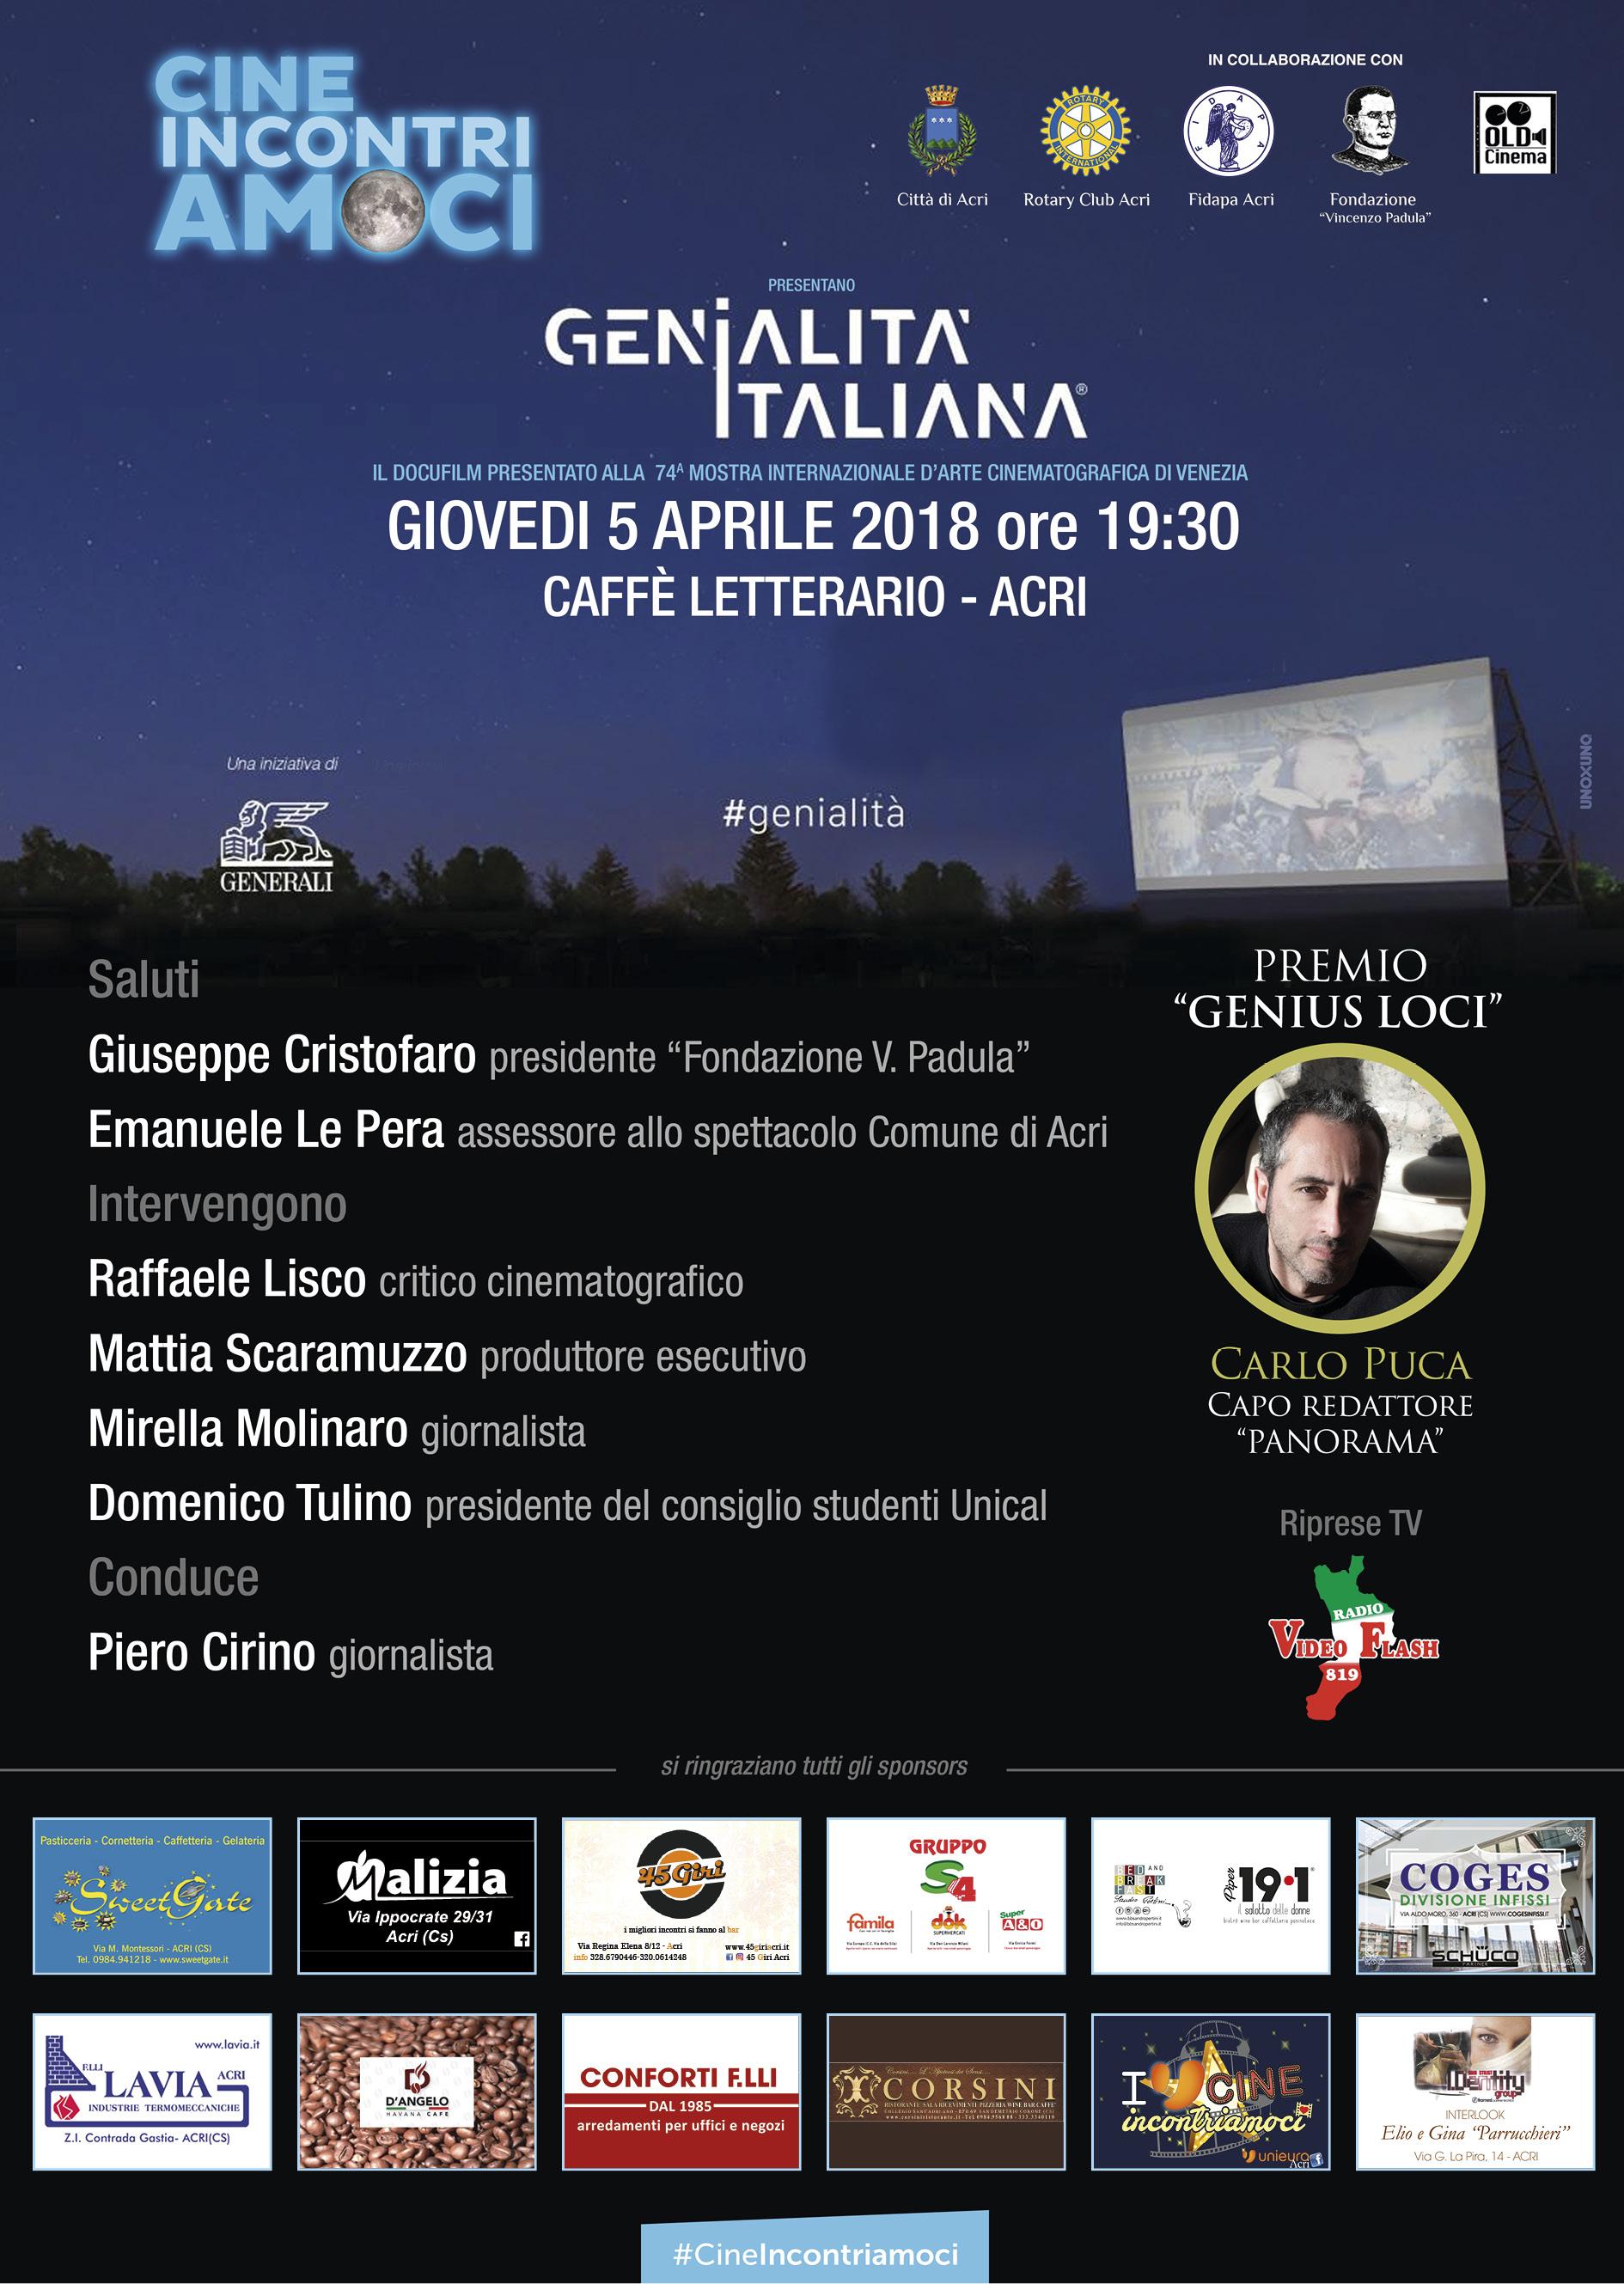 locandina CineIncontriamoci Genialità Italiana